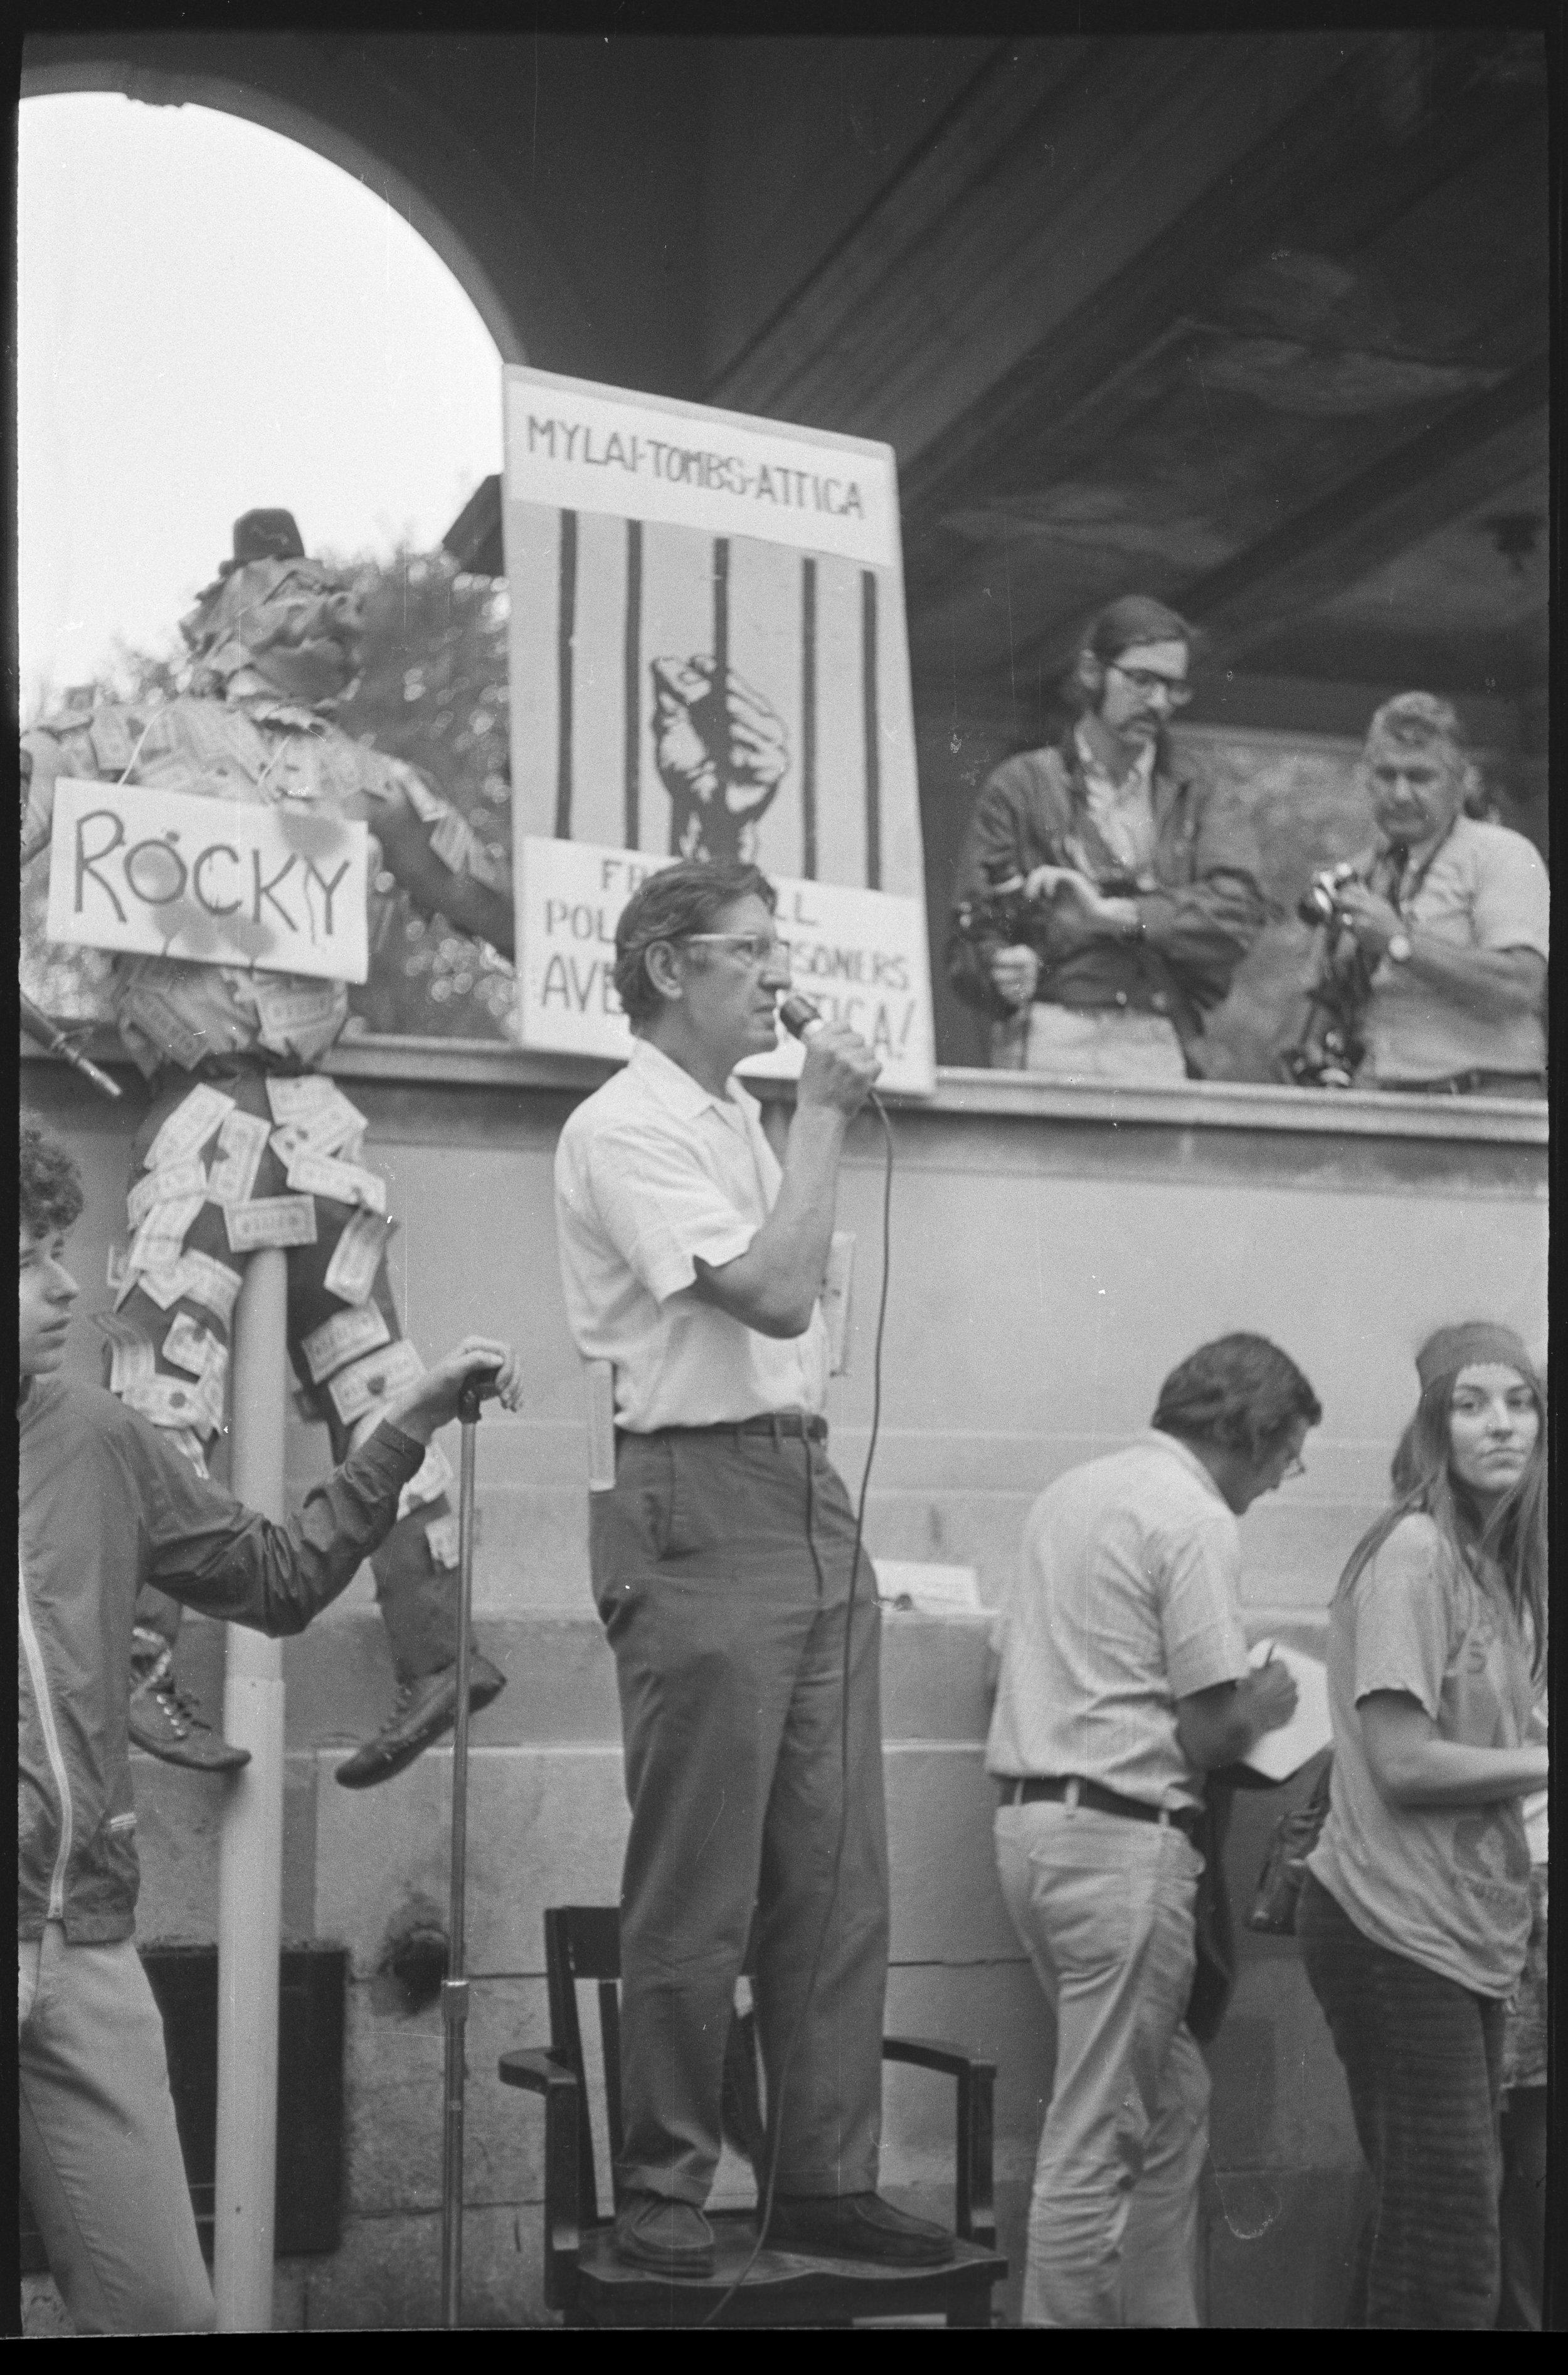 Demonstration scene at Rockefeller Plaza at Park Avenue and 17th Street, September 18, 1971